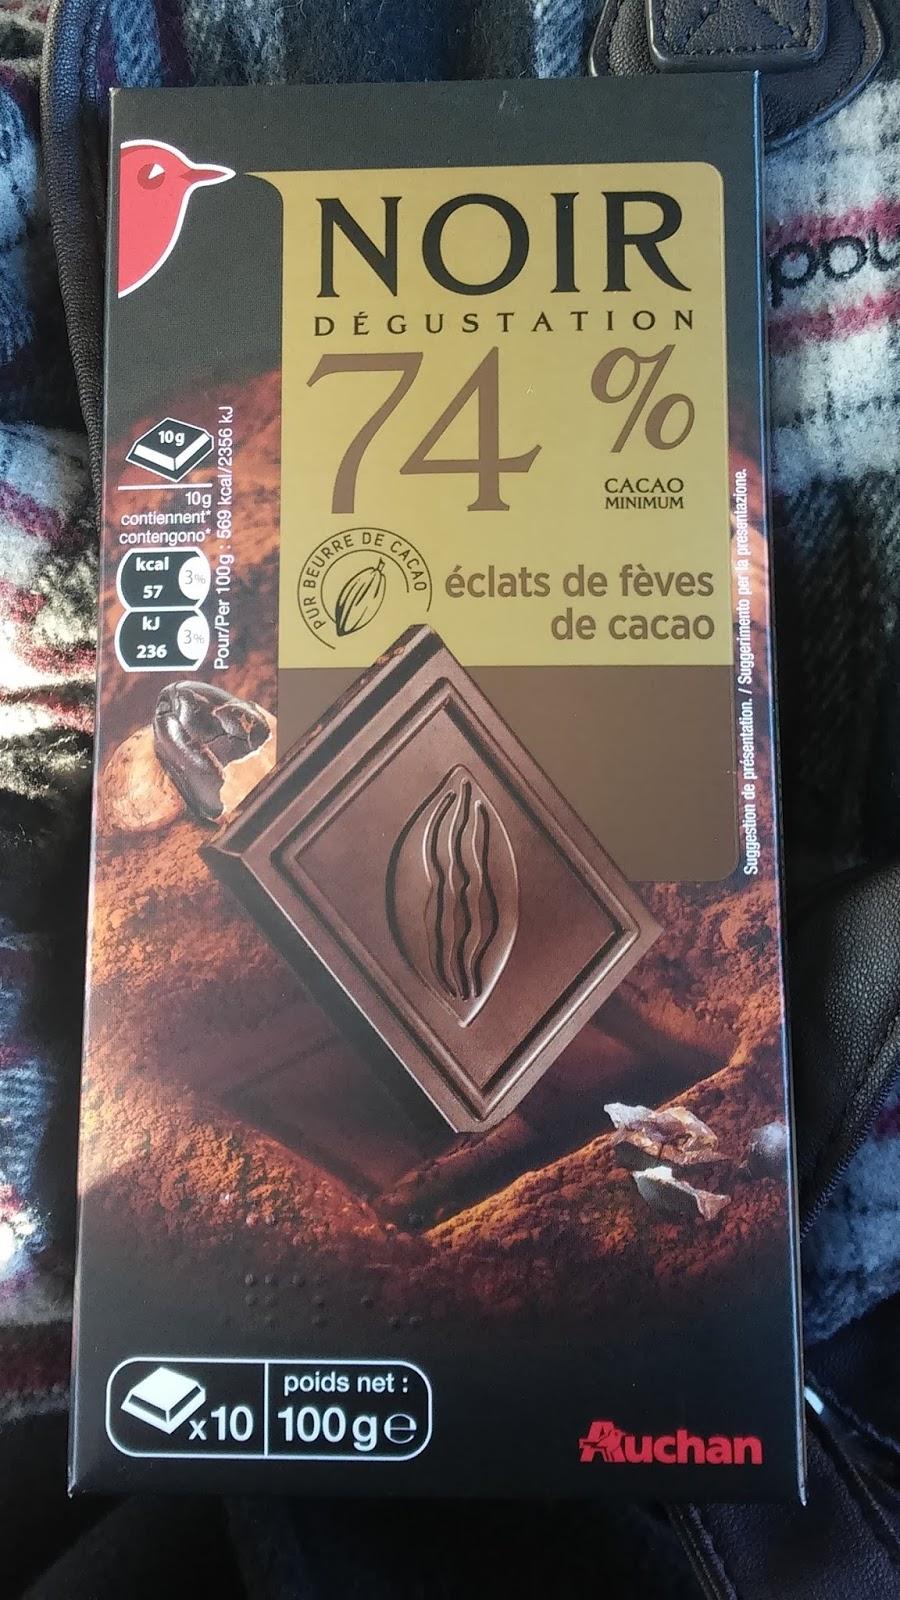 Auchan Noir Degustation - gorzka 74% z karmelizowanymi